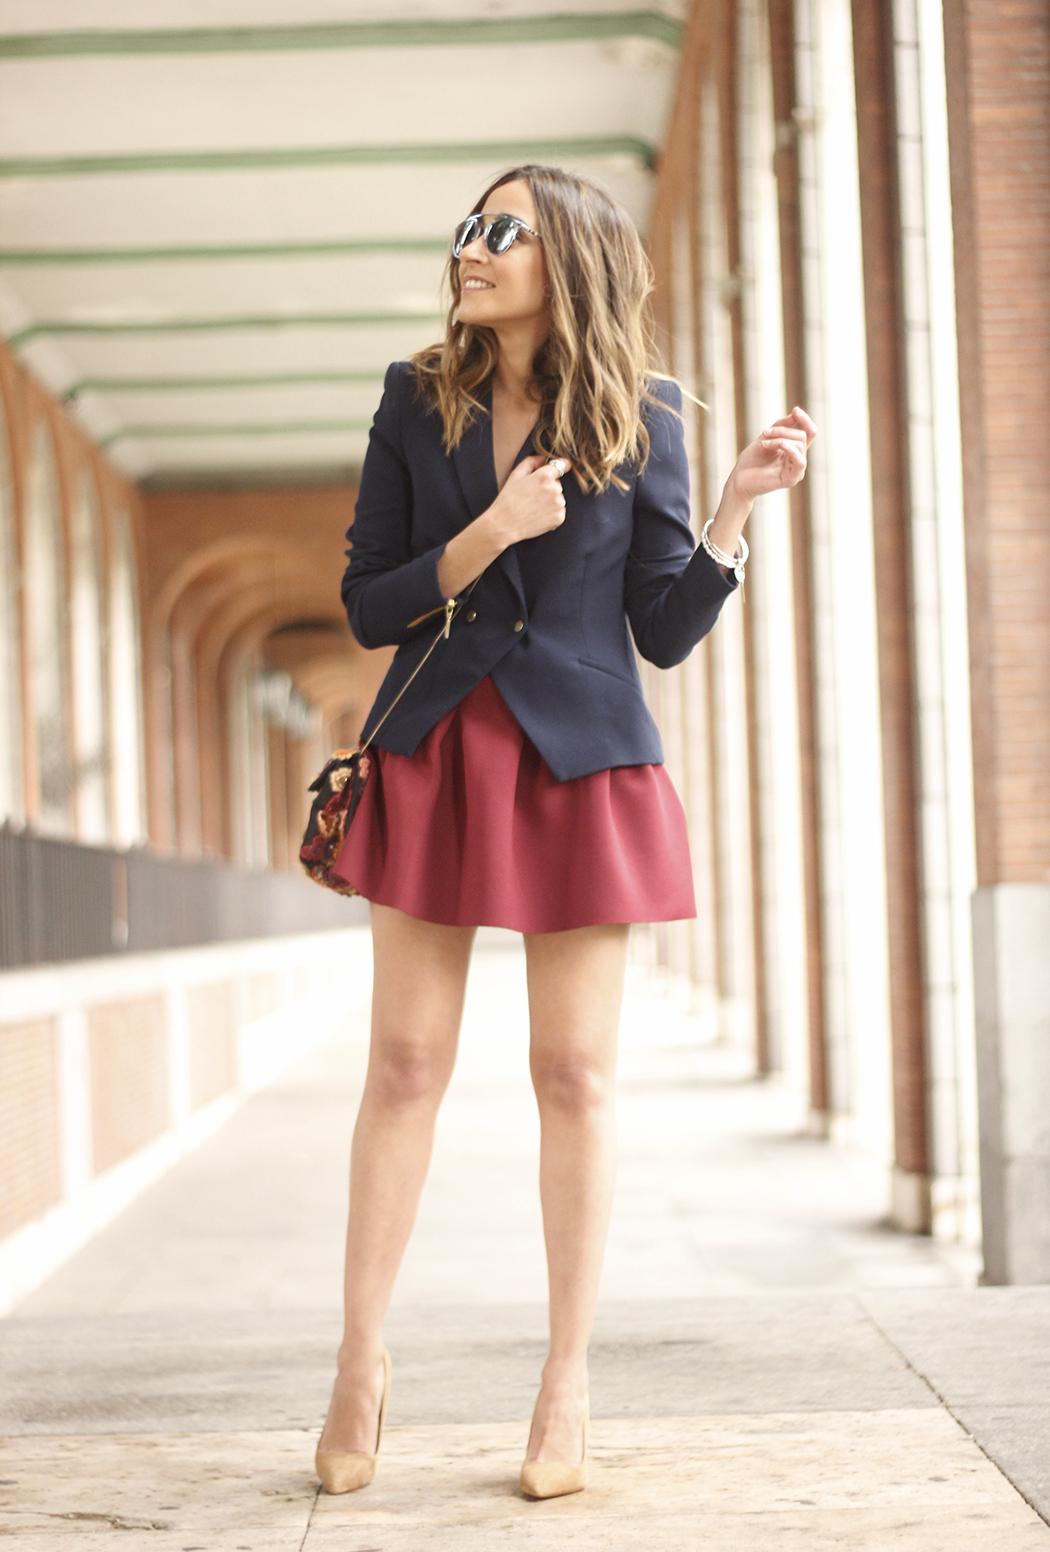 Blue Blazer Burgundy Skirt Outfit21